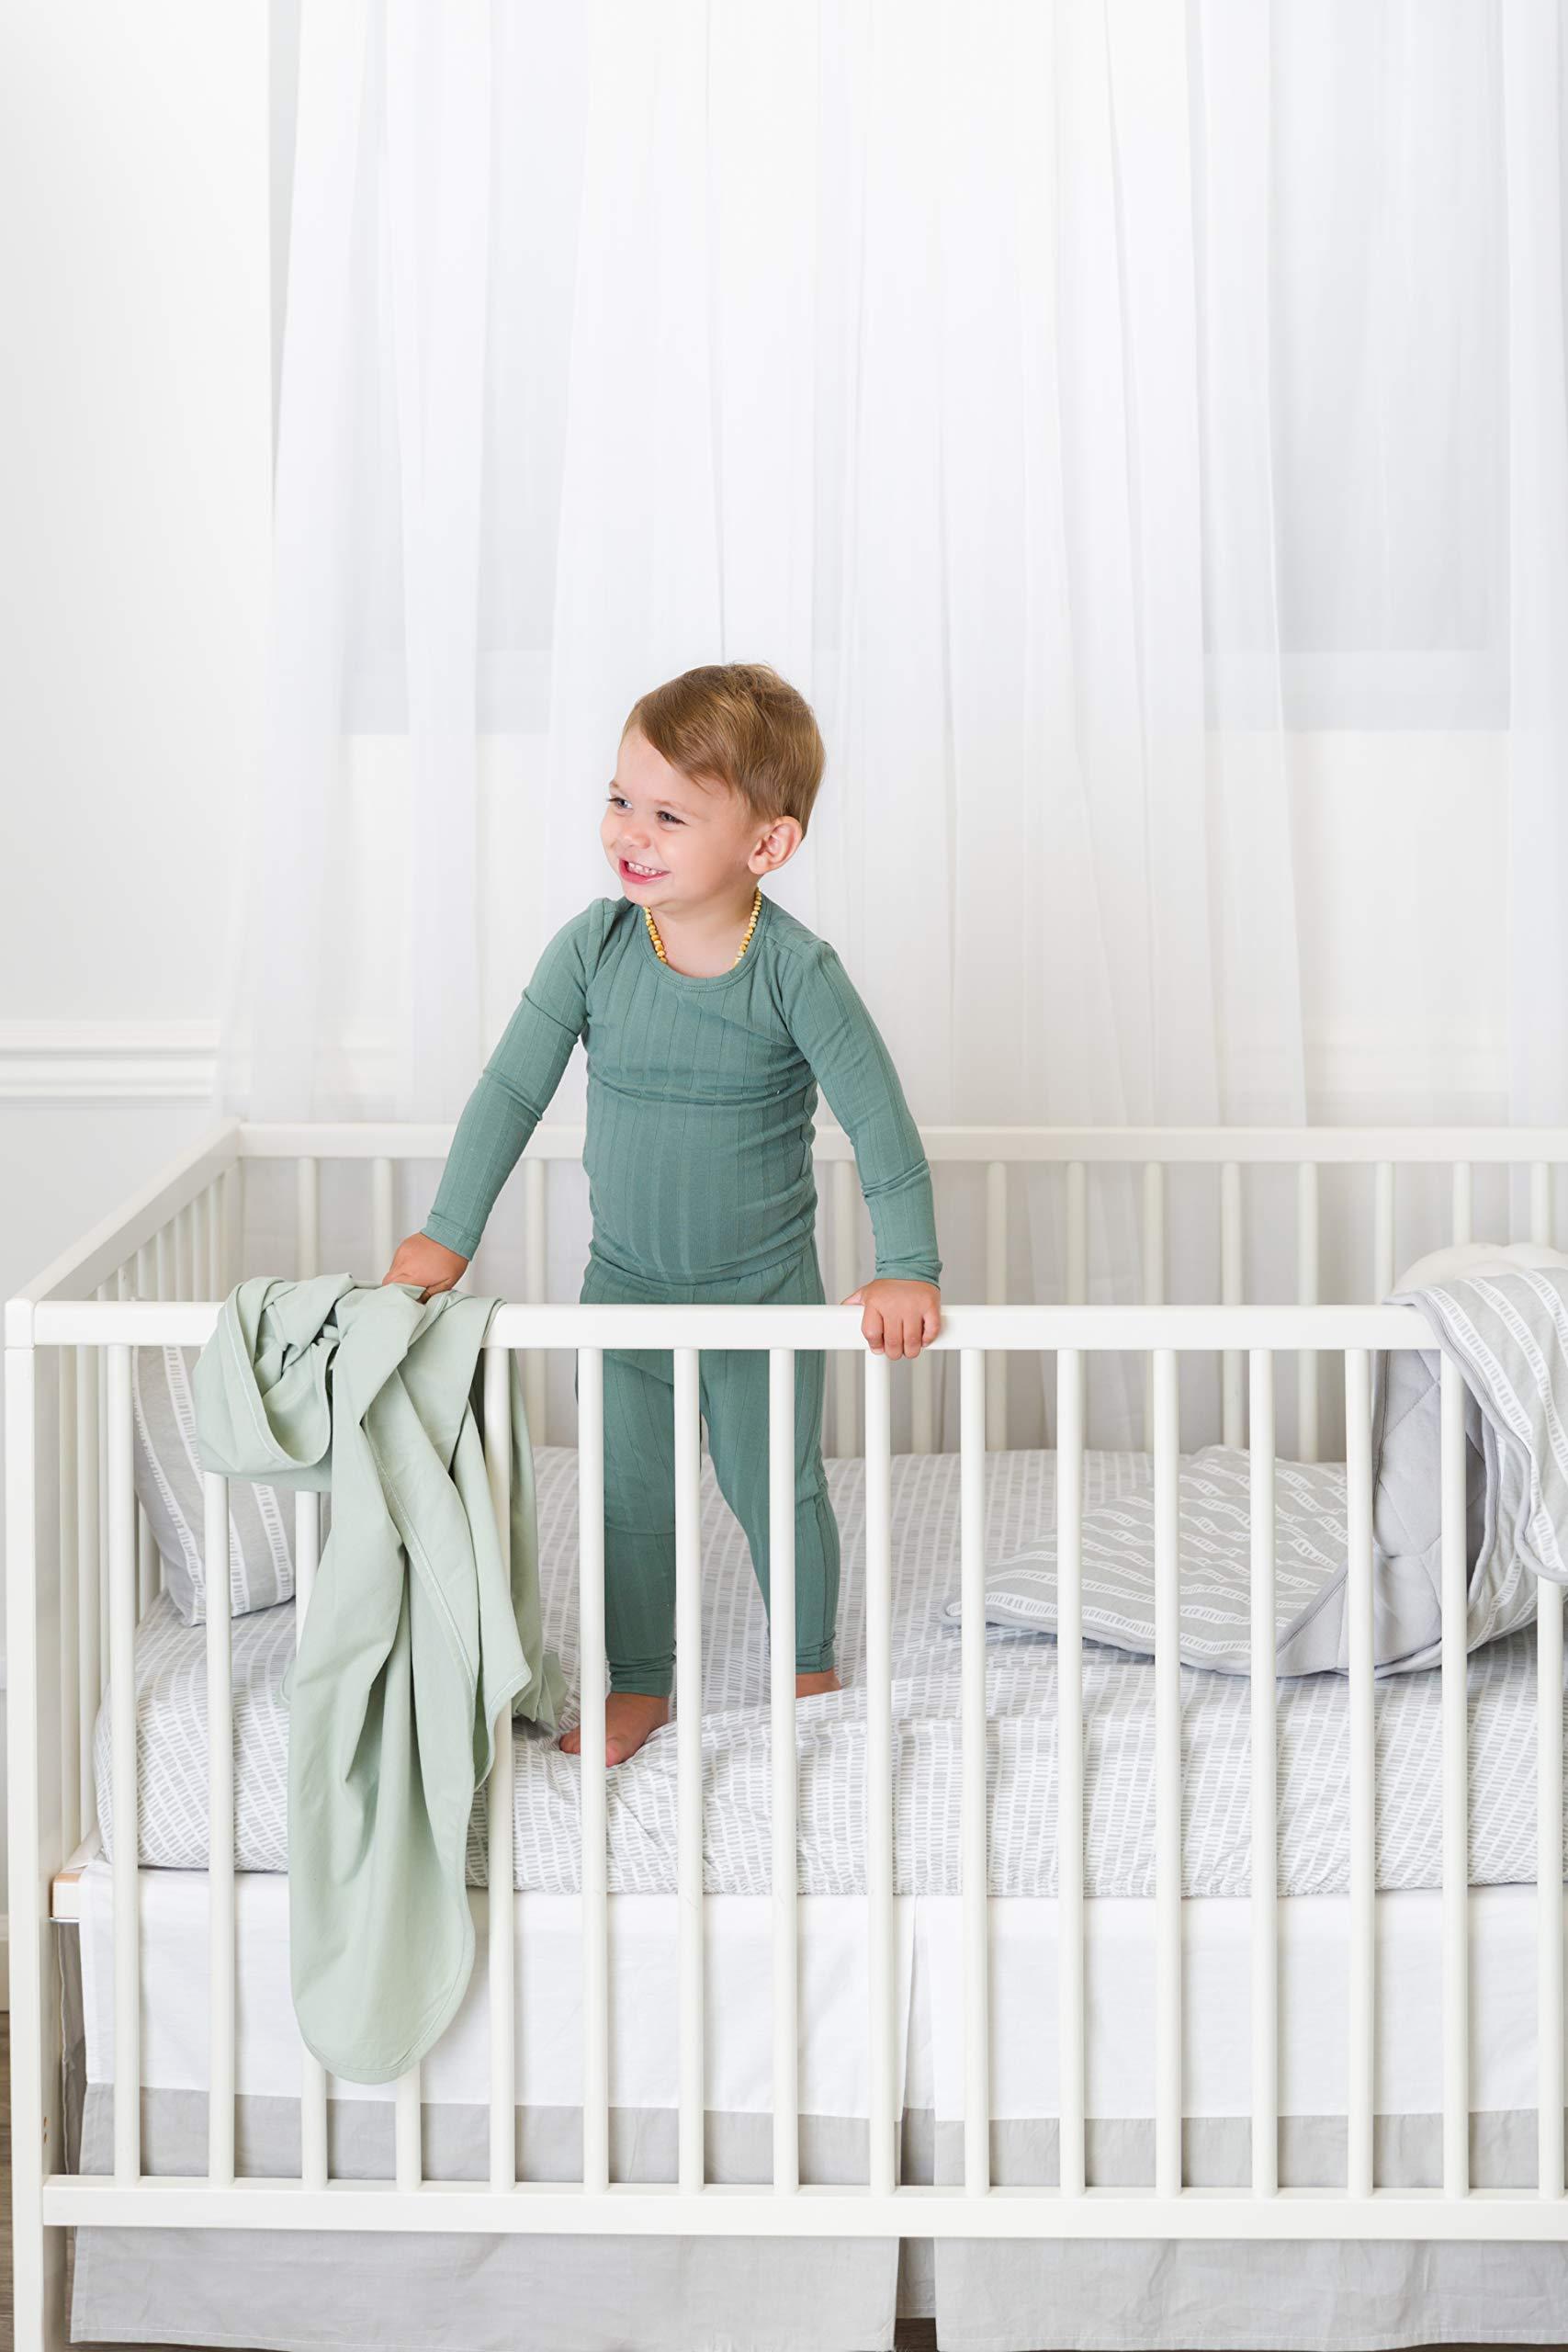 Baby Crib Set 4 pc, Crib Sheet,Quilted Blanket, Crib Skirt & Baby Pillow Case Grey Bamboo Design Combo